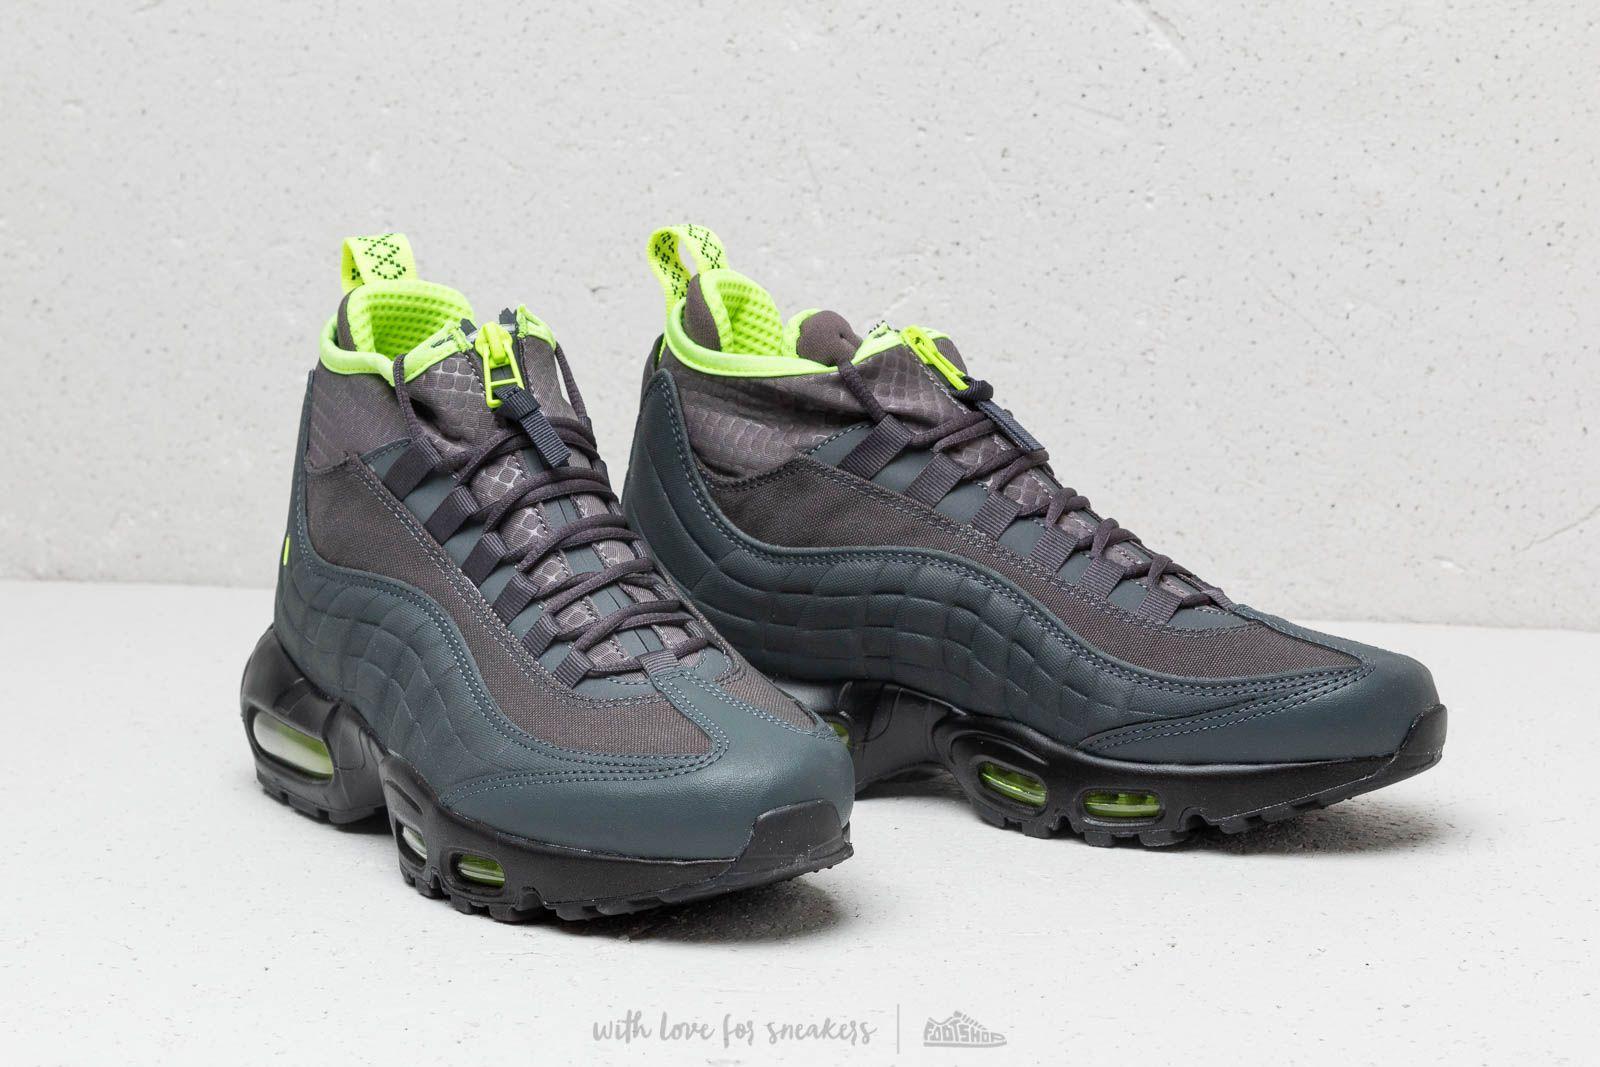 promo code d2901 0bef0 Nike Air Max 95 Sneakerboot Anthracite/ Volt-Dark Frey ...